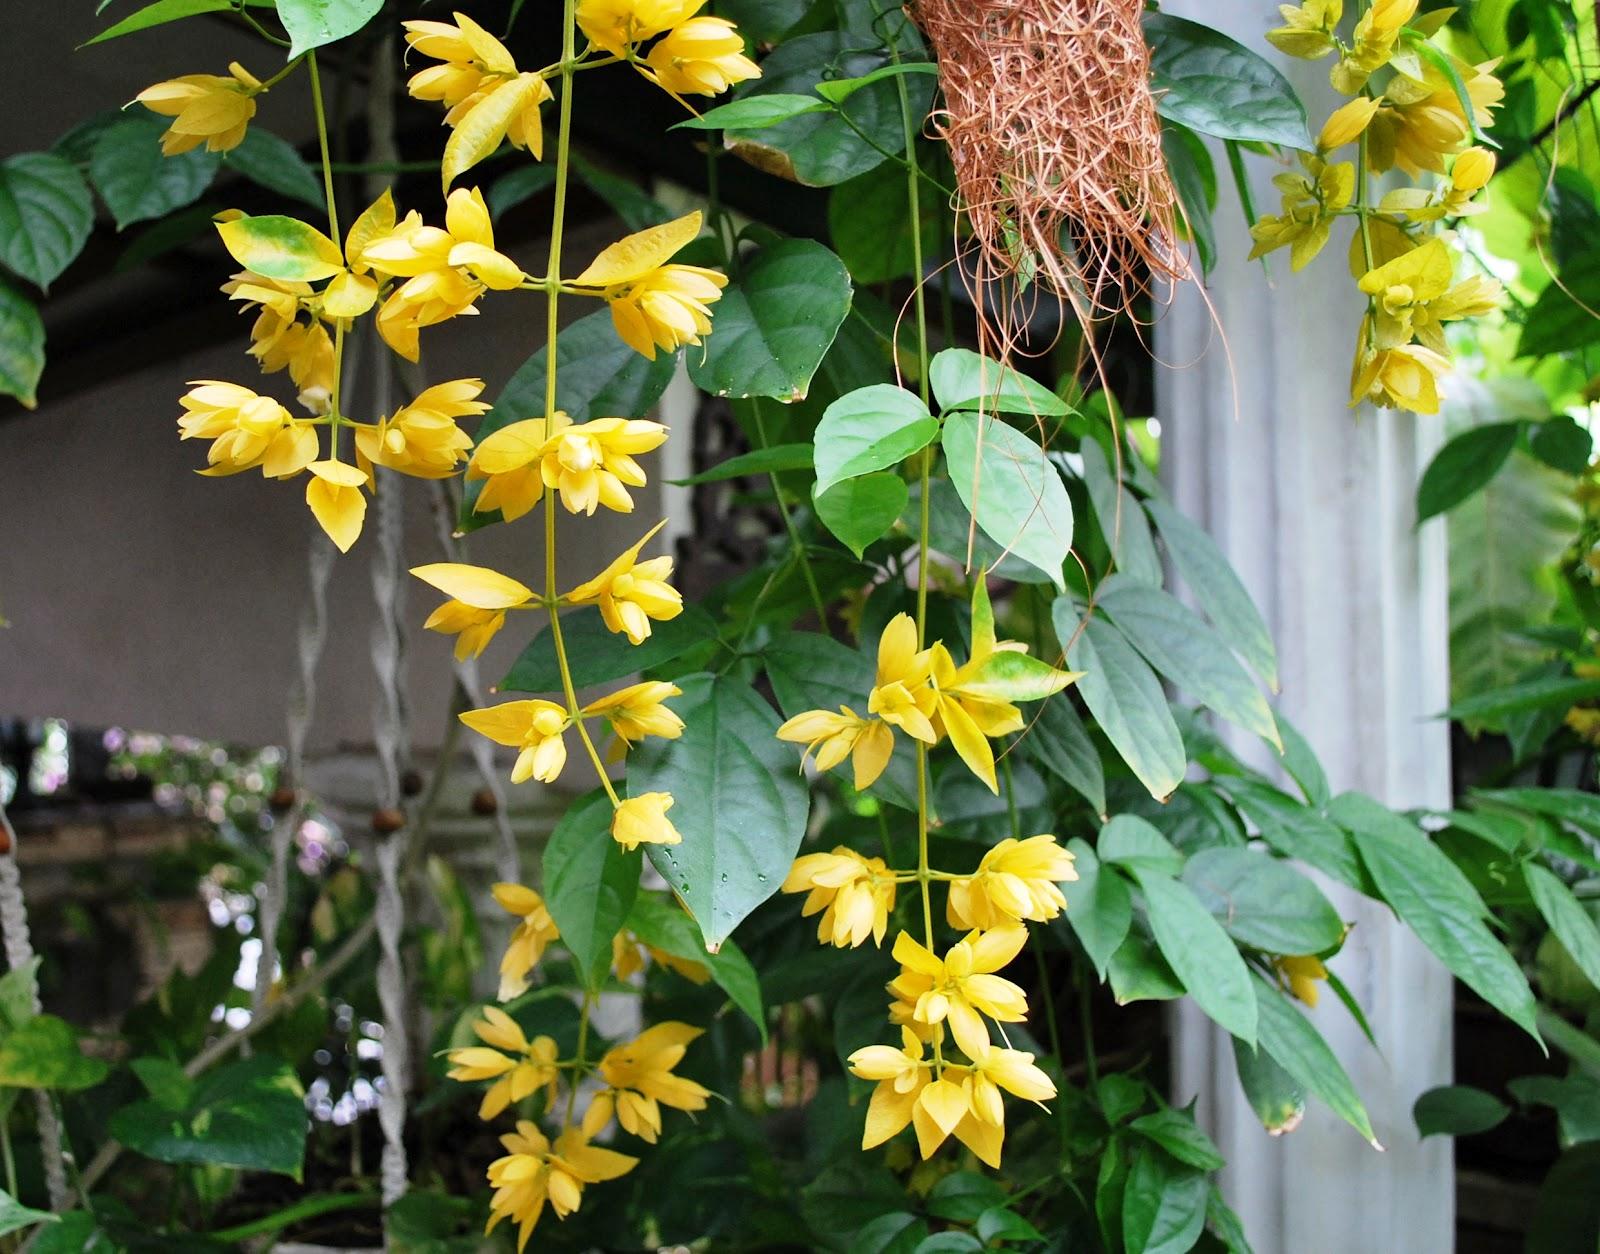 Pak Idruss Blog The Hanging Flowers